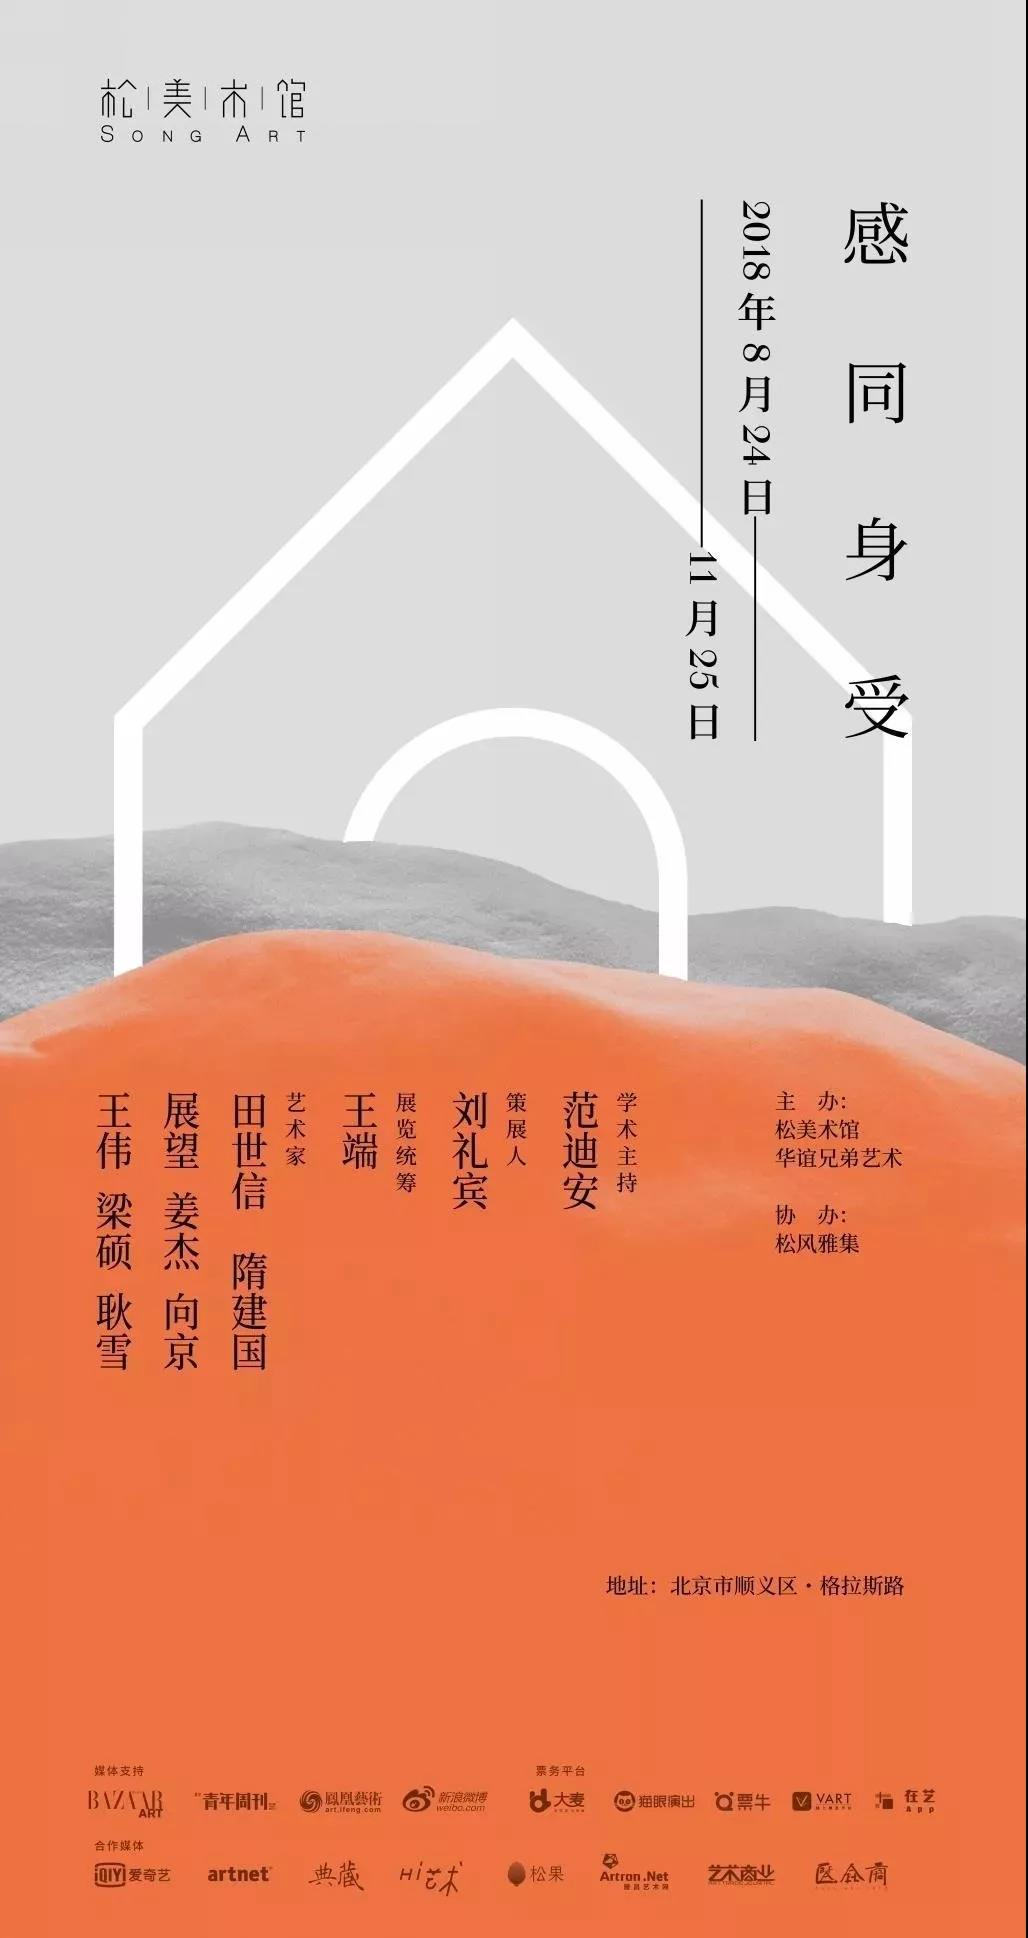 WeChat Image_20180902194358